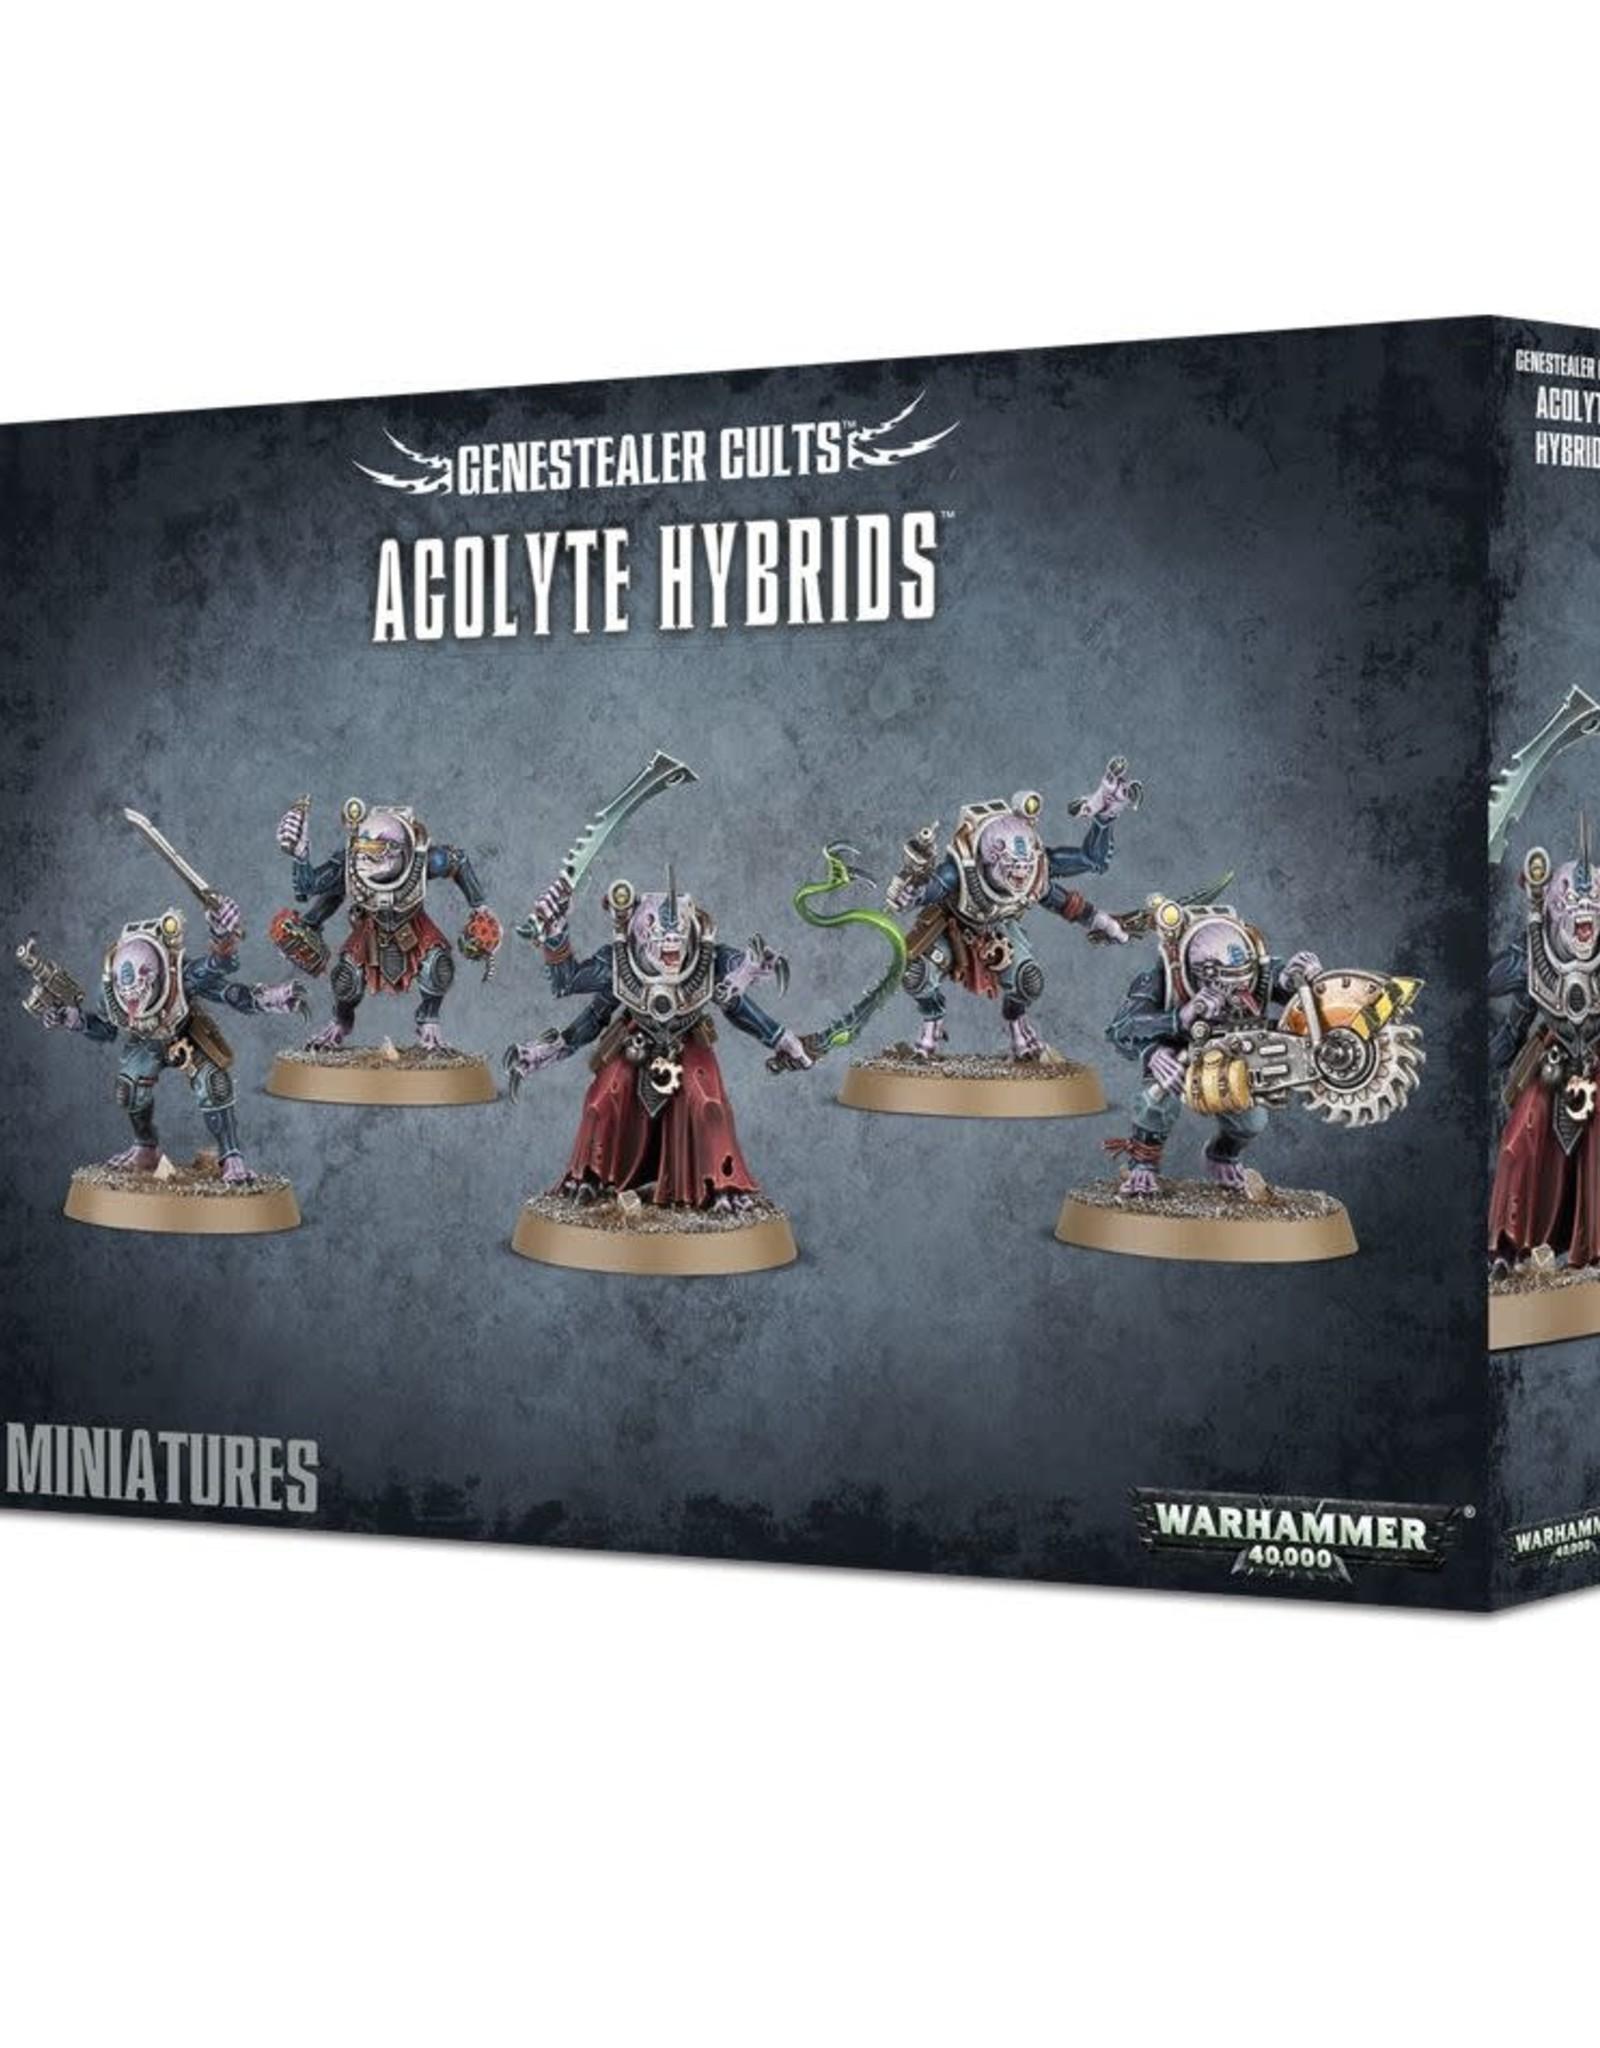 Warhammer 40K Genestealer Cults Acolyte Hybrids/Hybrid Metamorphs